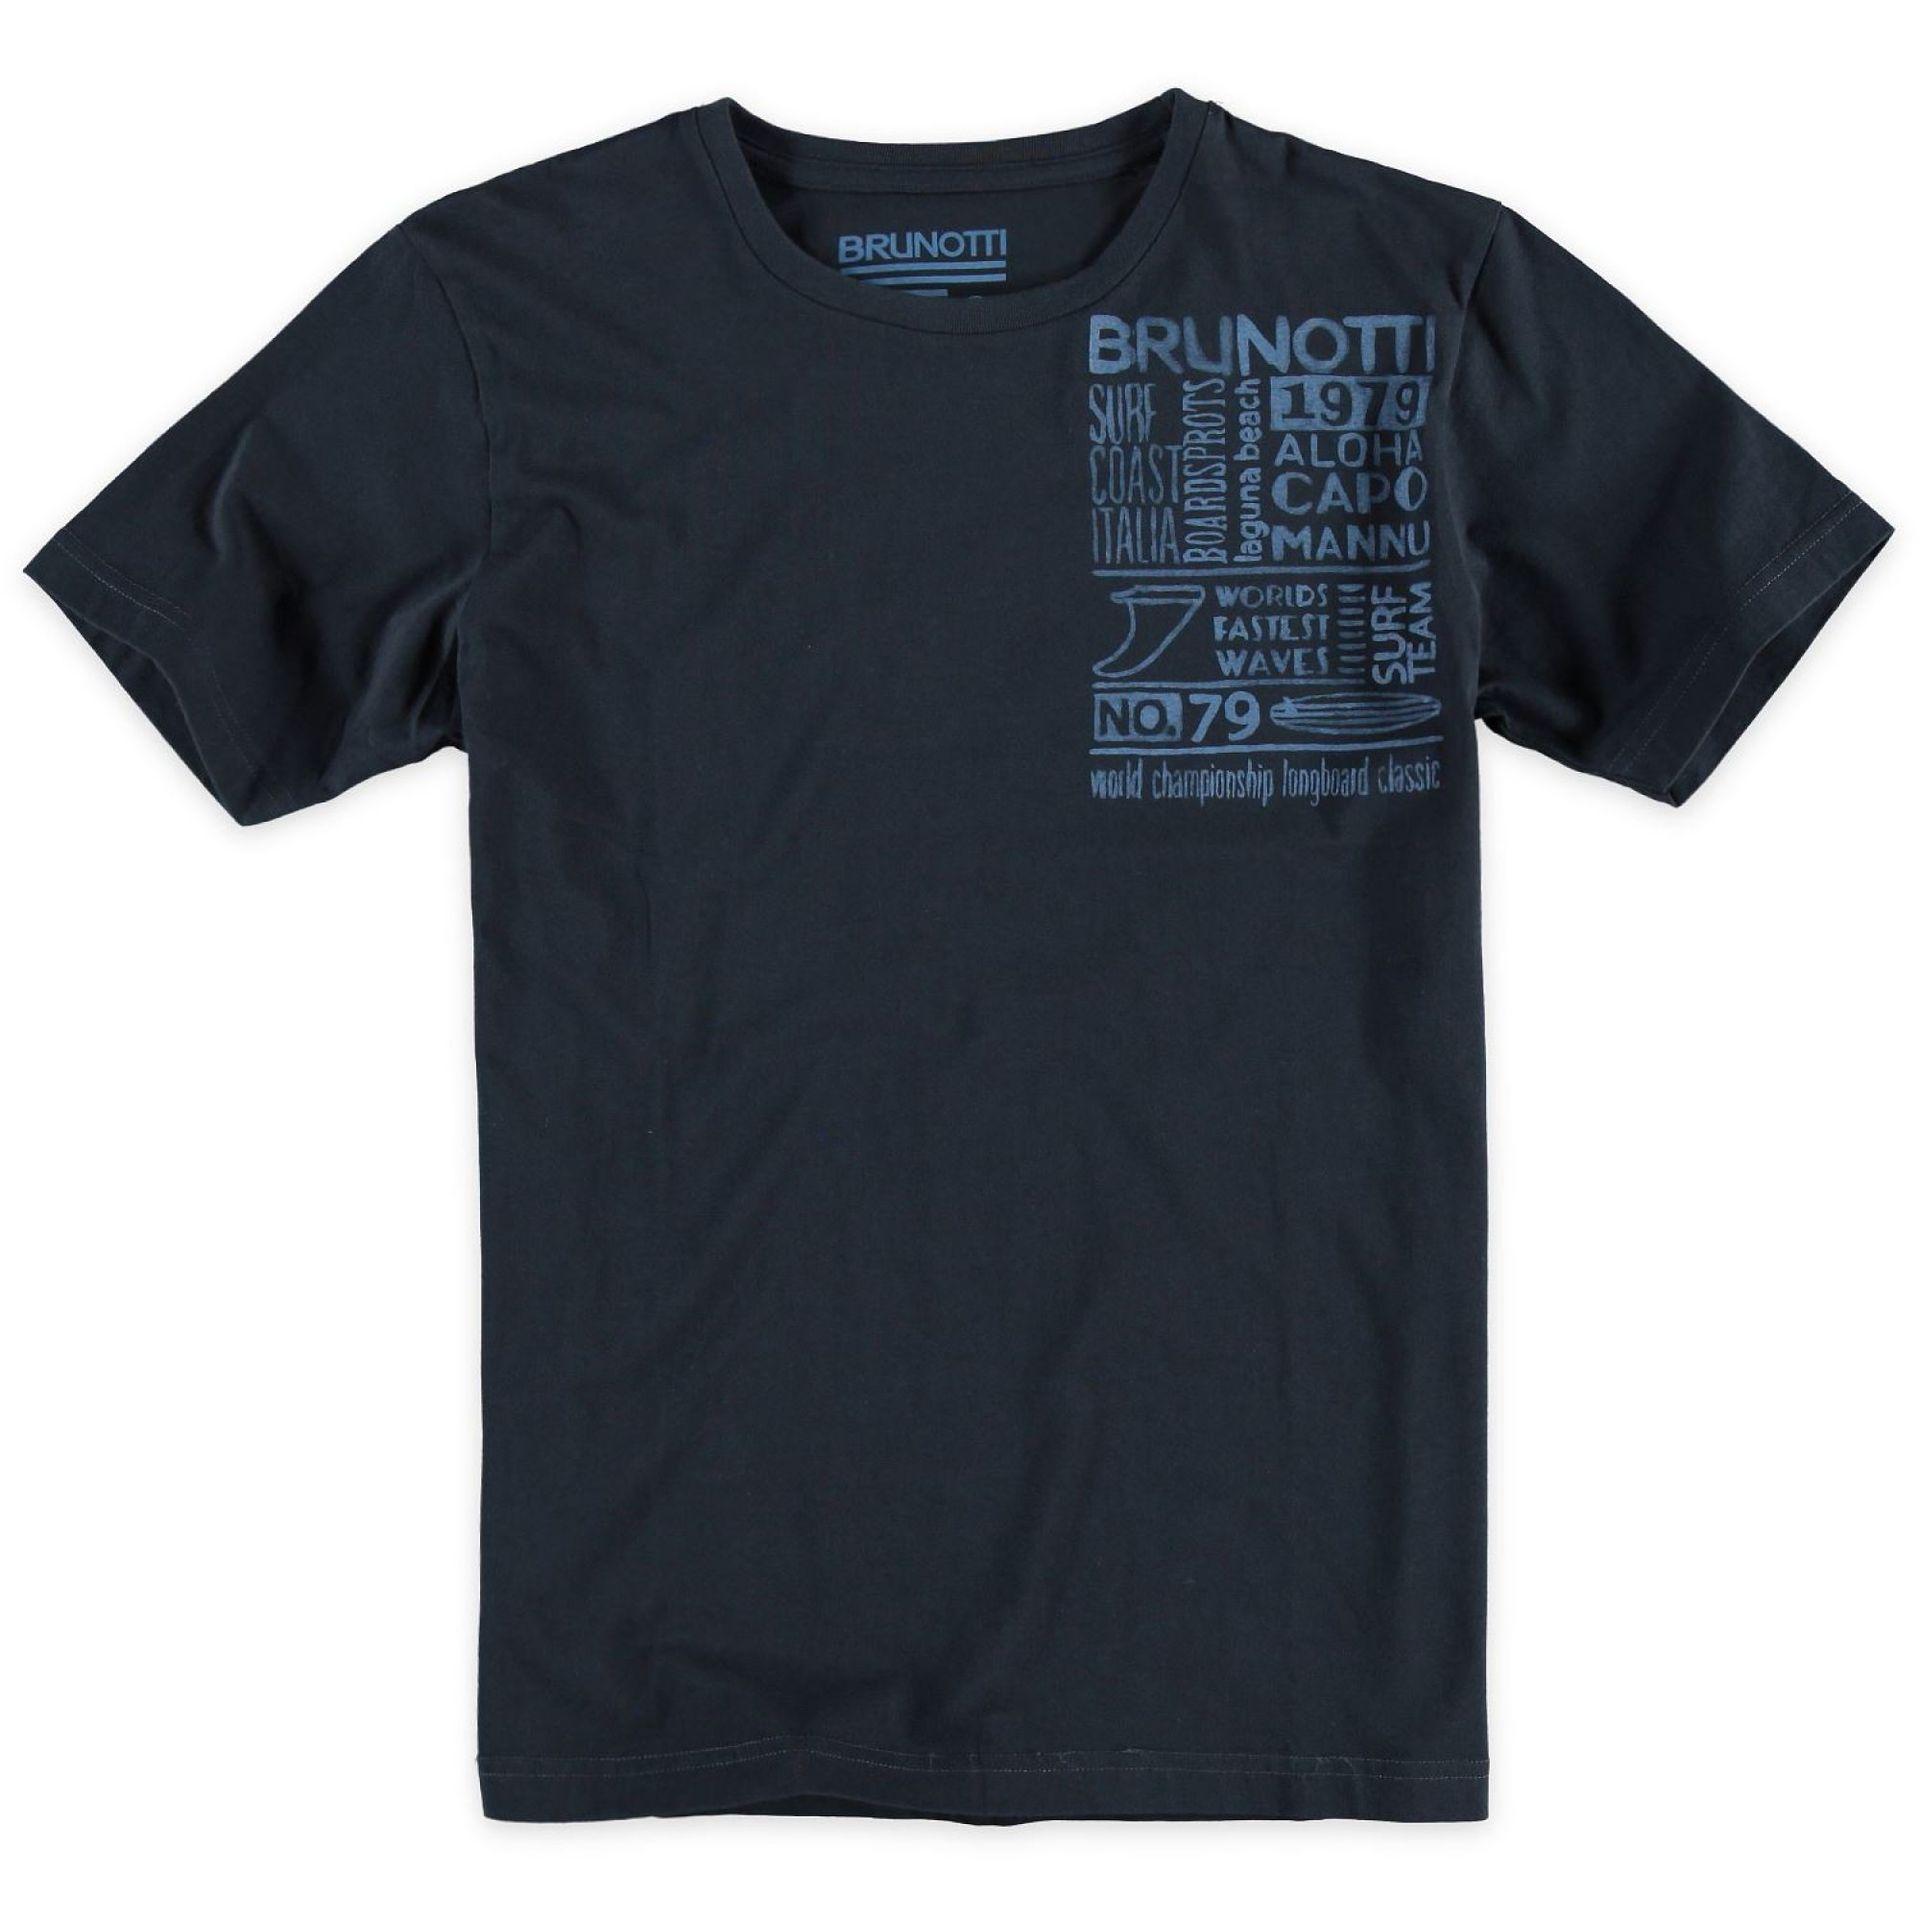 T-shirt Brunotti Altaro P-6011